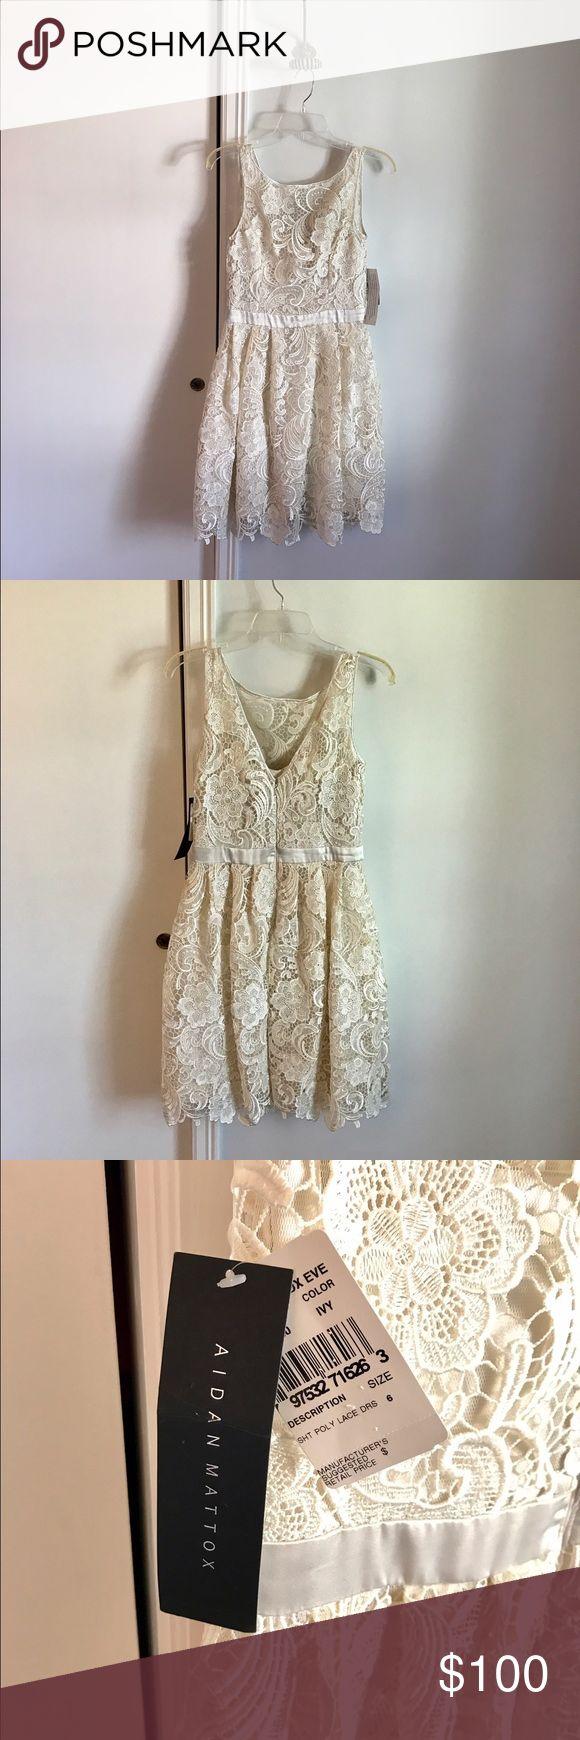 New Aidan Mattox Ivory Lace Reception Dress Beautiful brand new Aidan Mattox reception dress. Size 6, never worn. Runs small in the chest. Aidan Mattox Dresses Wedding